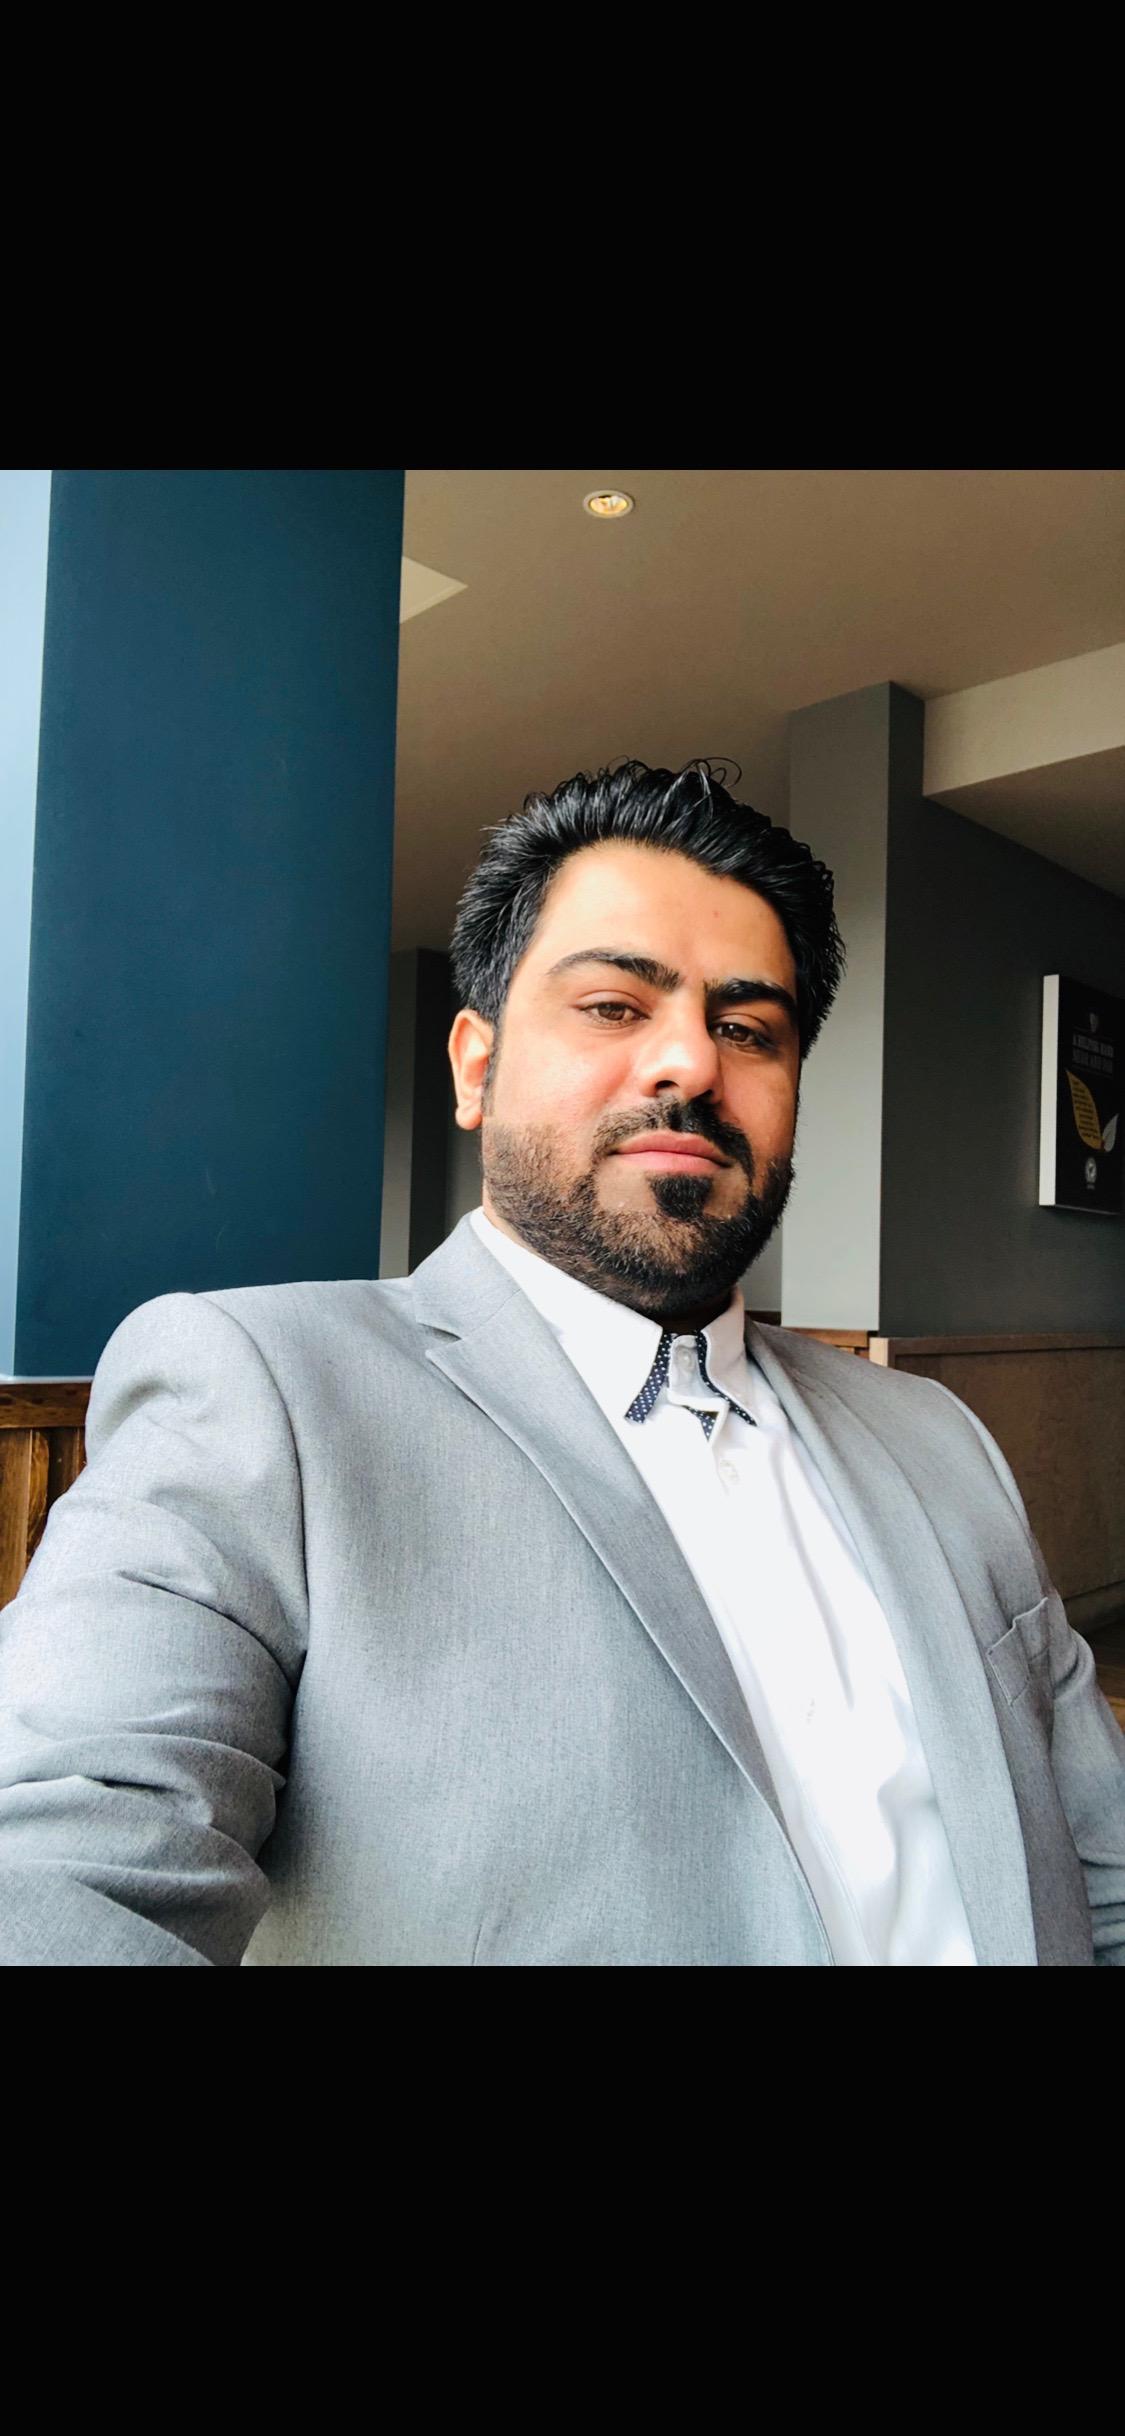 Majed Alshammari